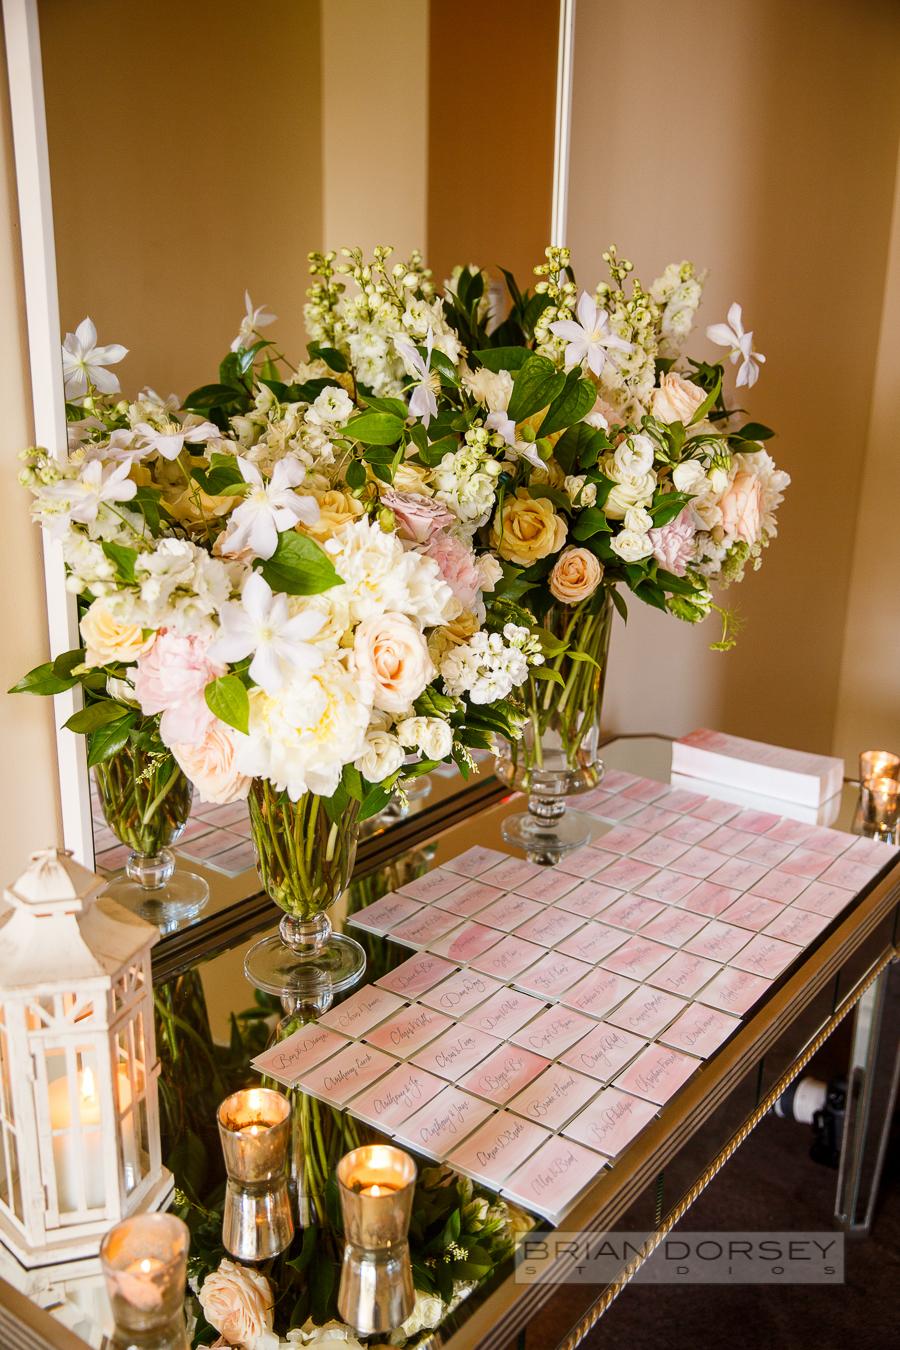 isola nomo soho hotel wedding brian dorsey studios ang weddings and events-21.jpg